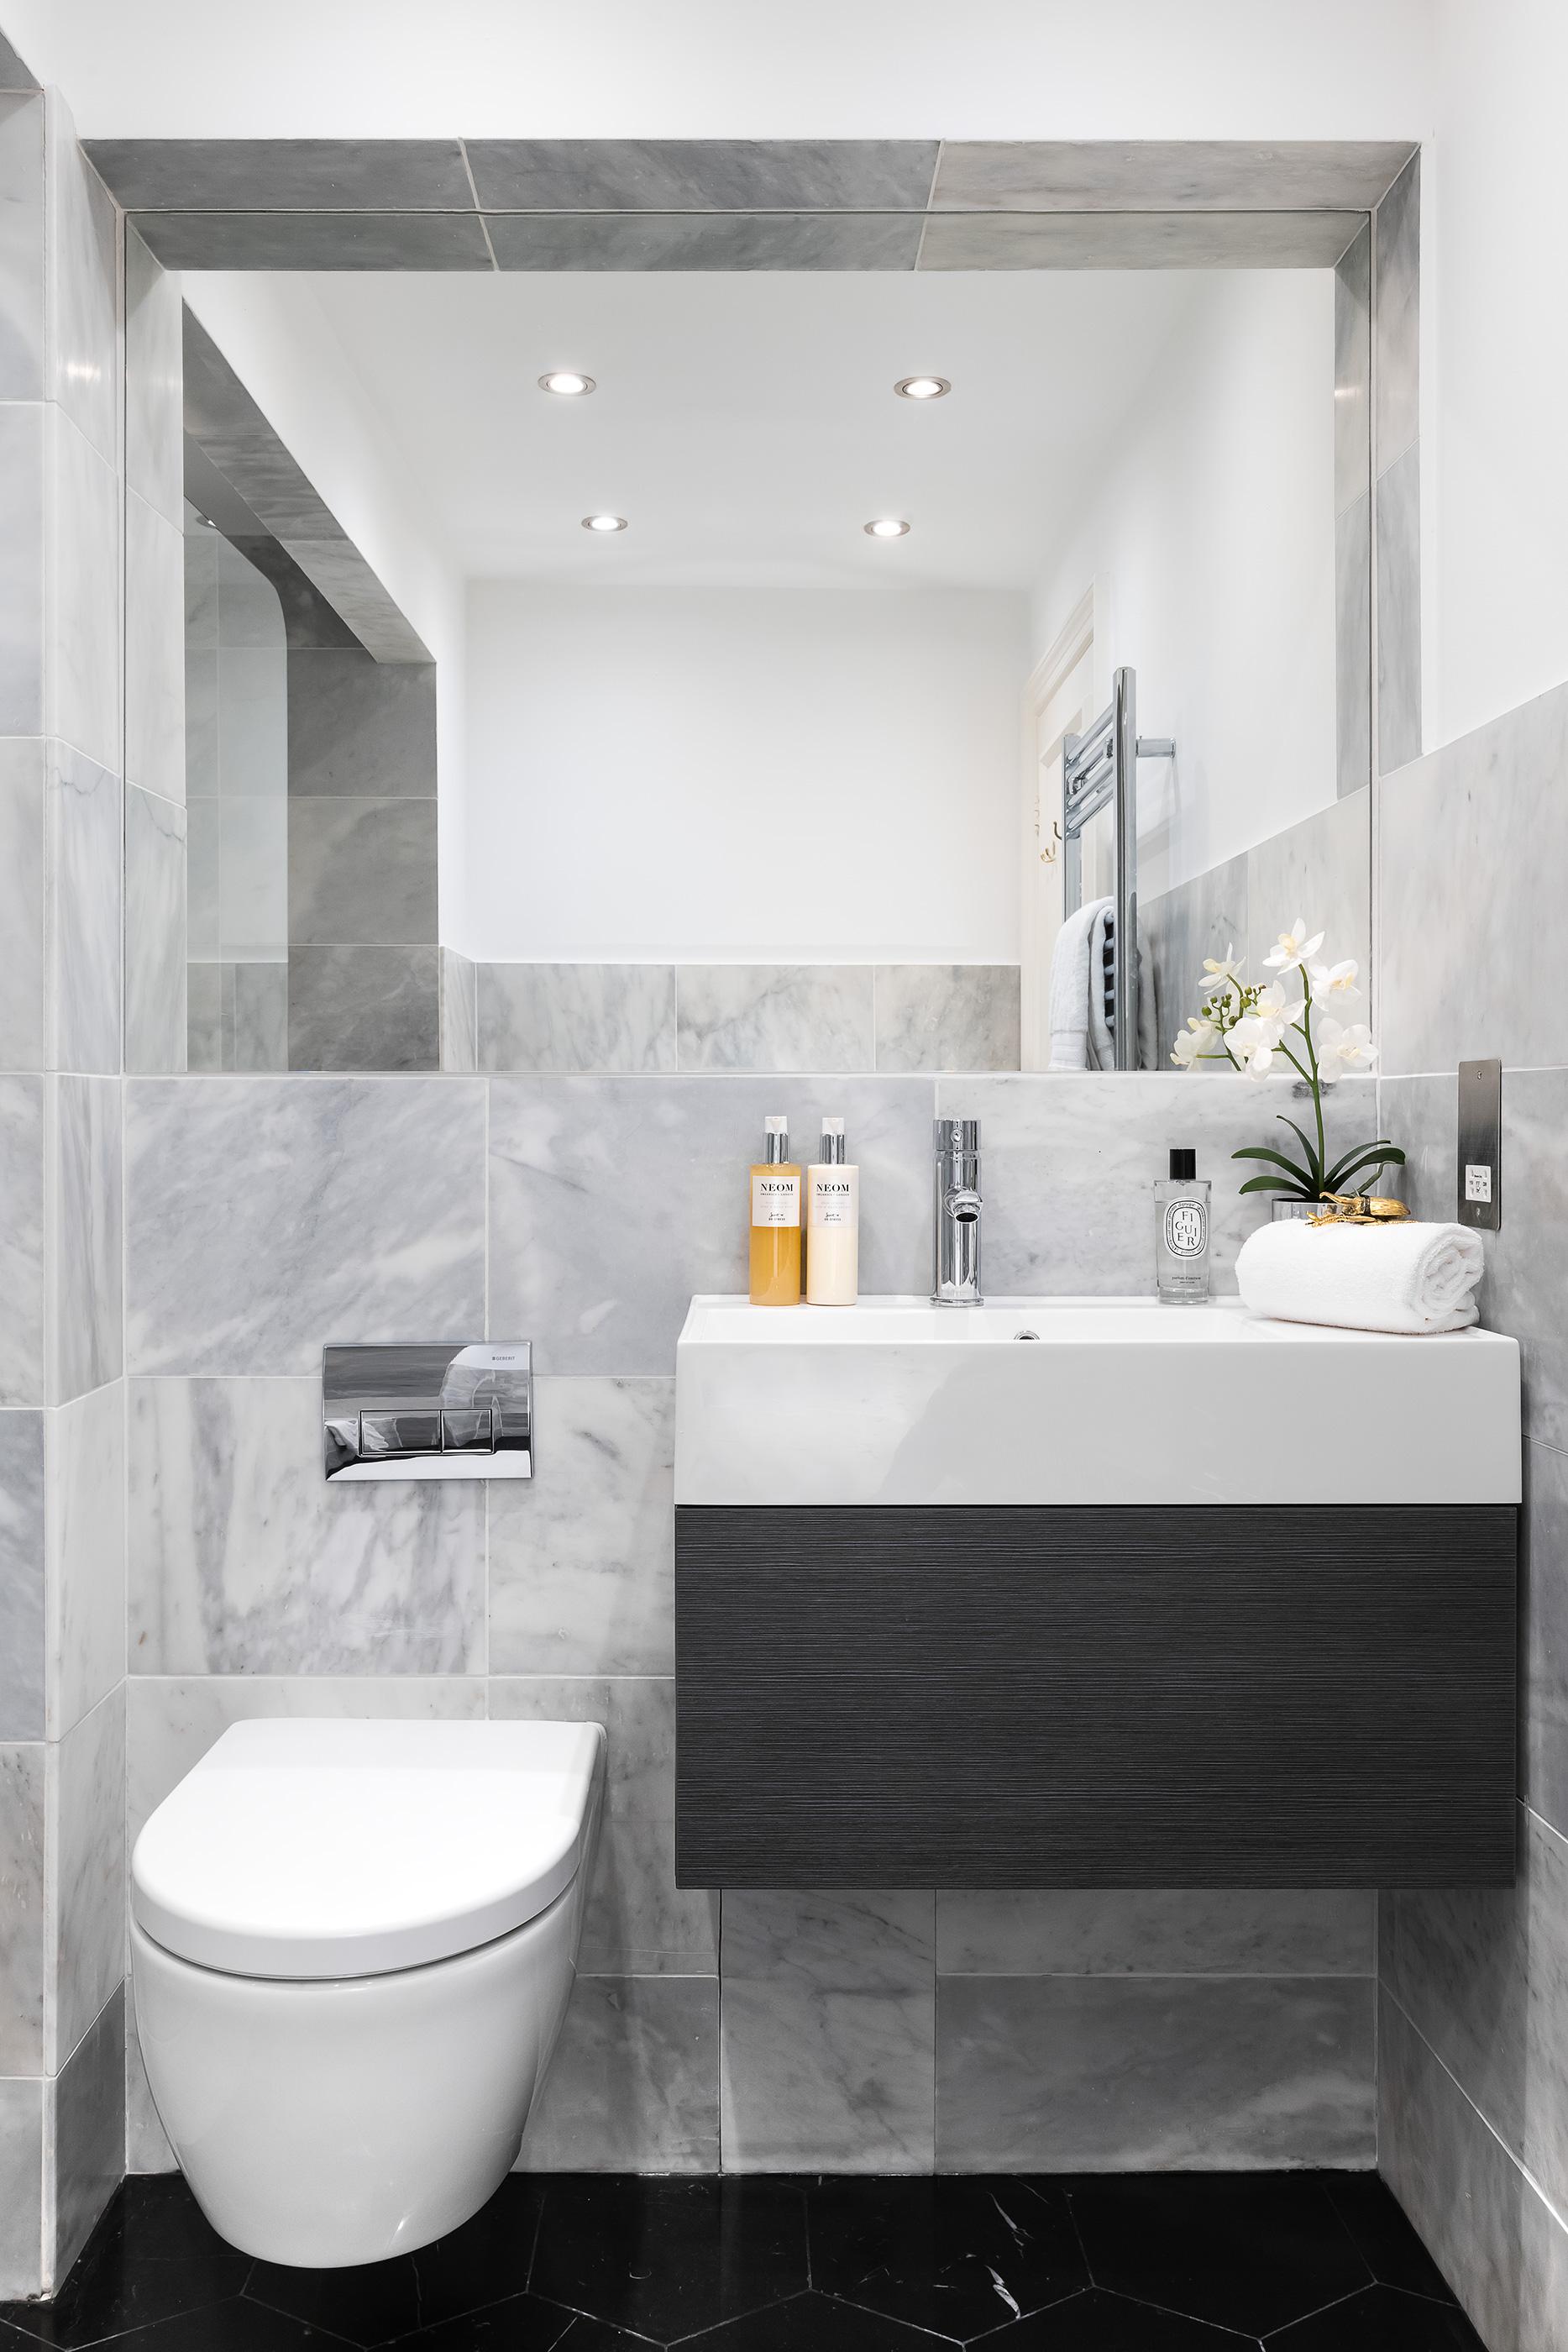 Bathroom_VR_12.jpg